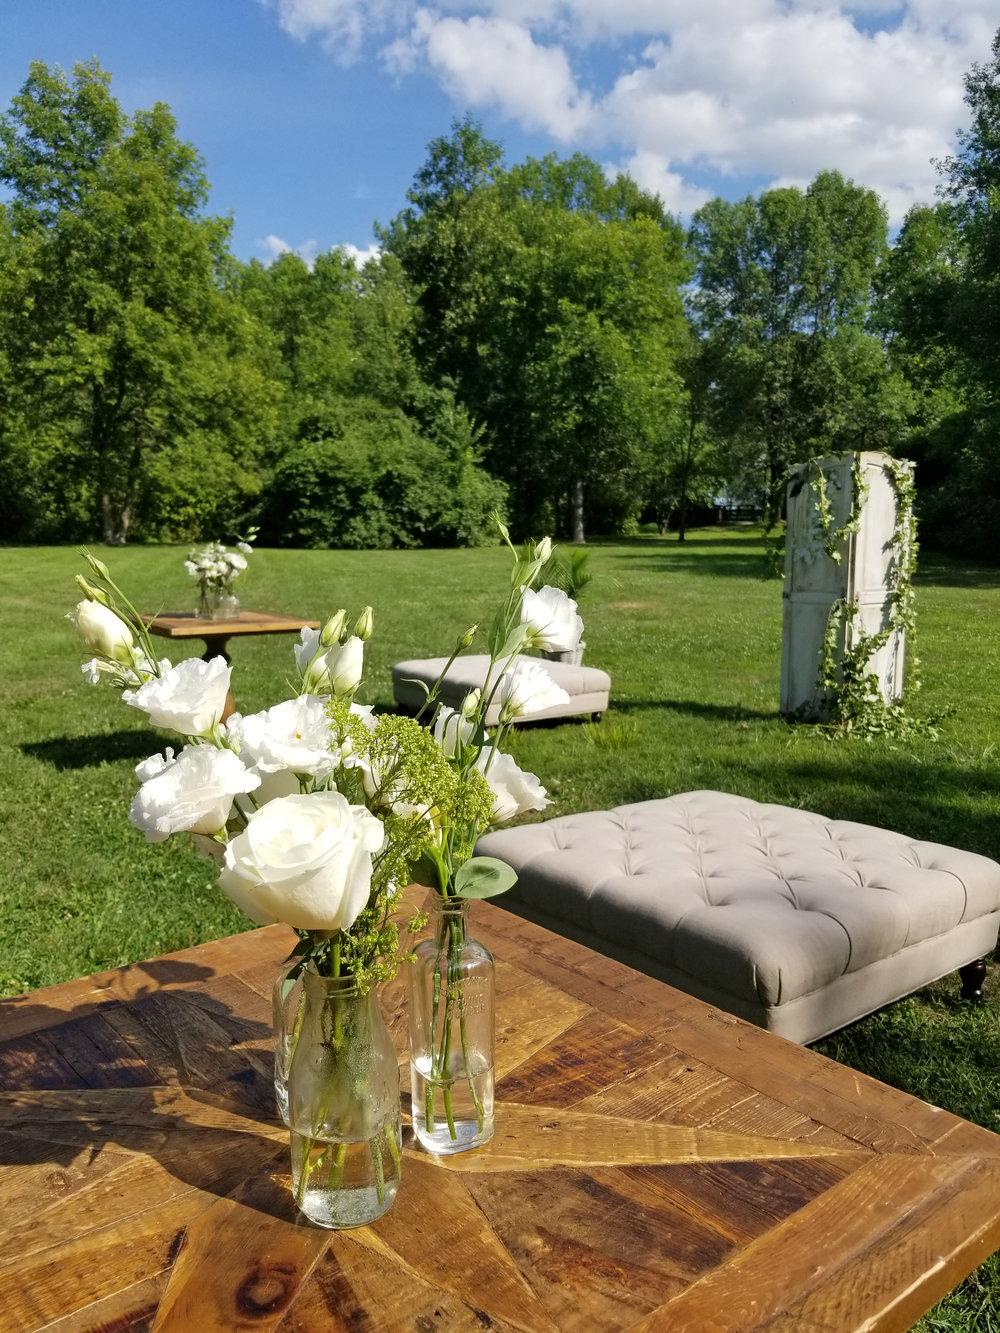 Natural Organic Montreal Wedding Pointe du Moulin Florist Flowers 20180819_154249.jpg